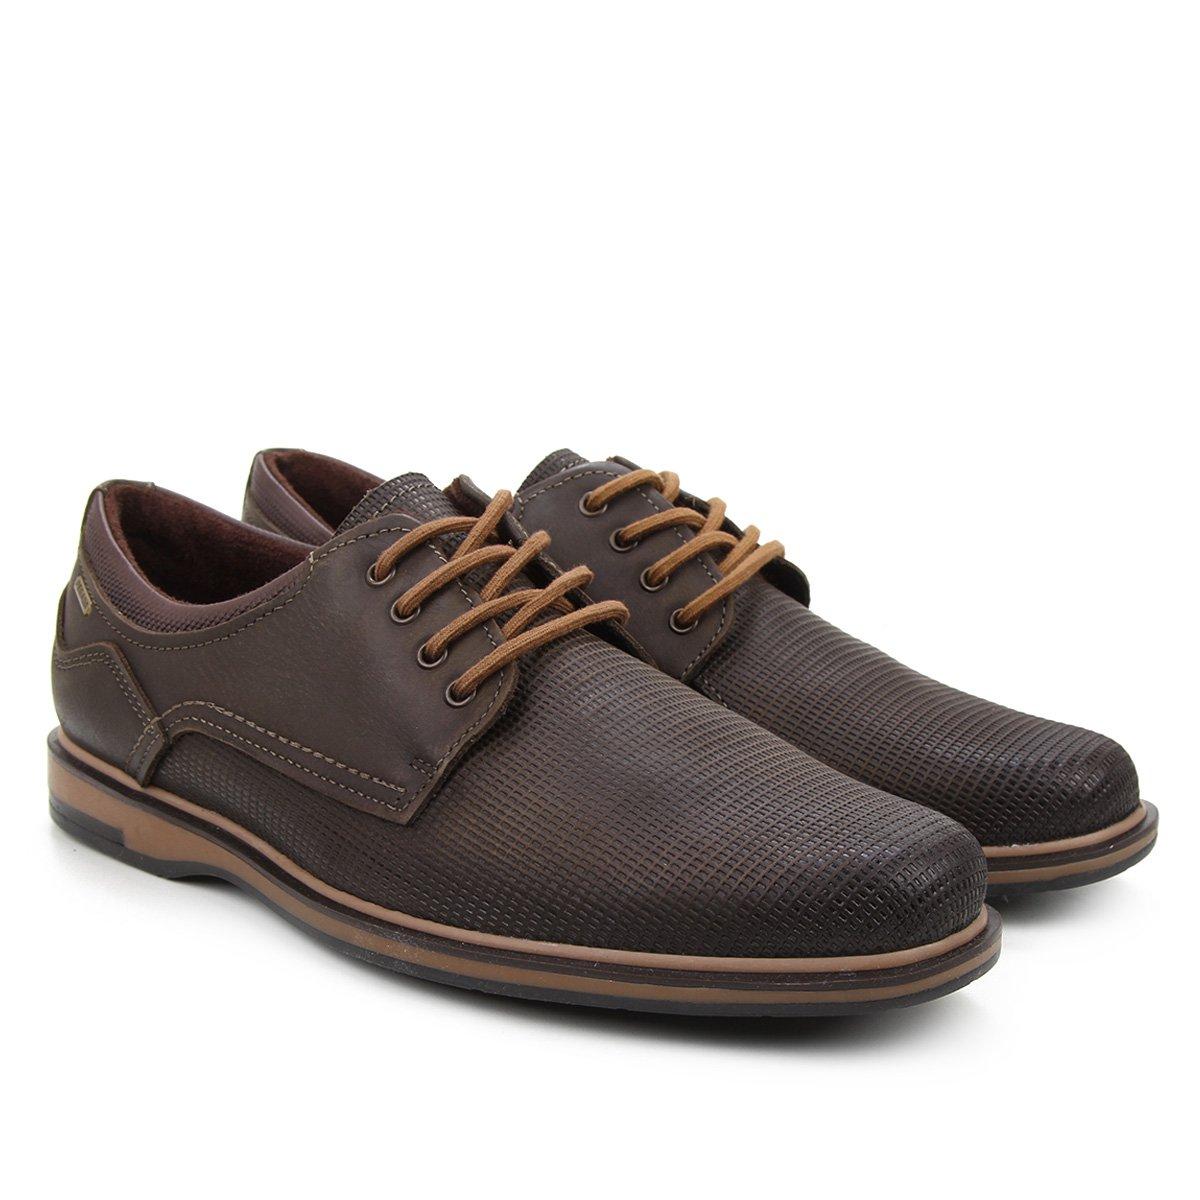 Sapato Casual Couro Pegada Textura Masculino